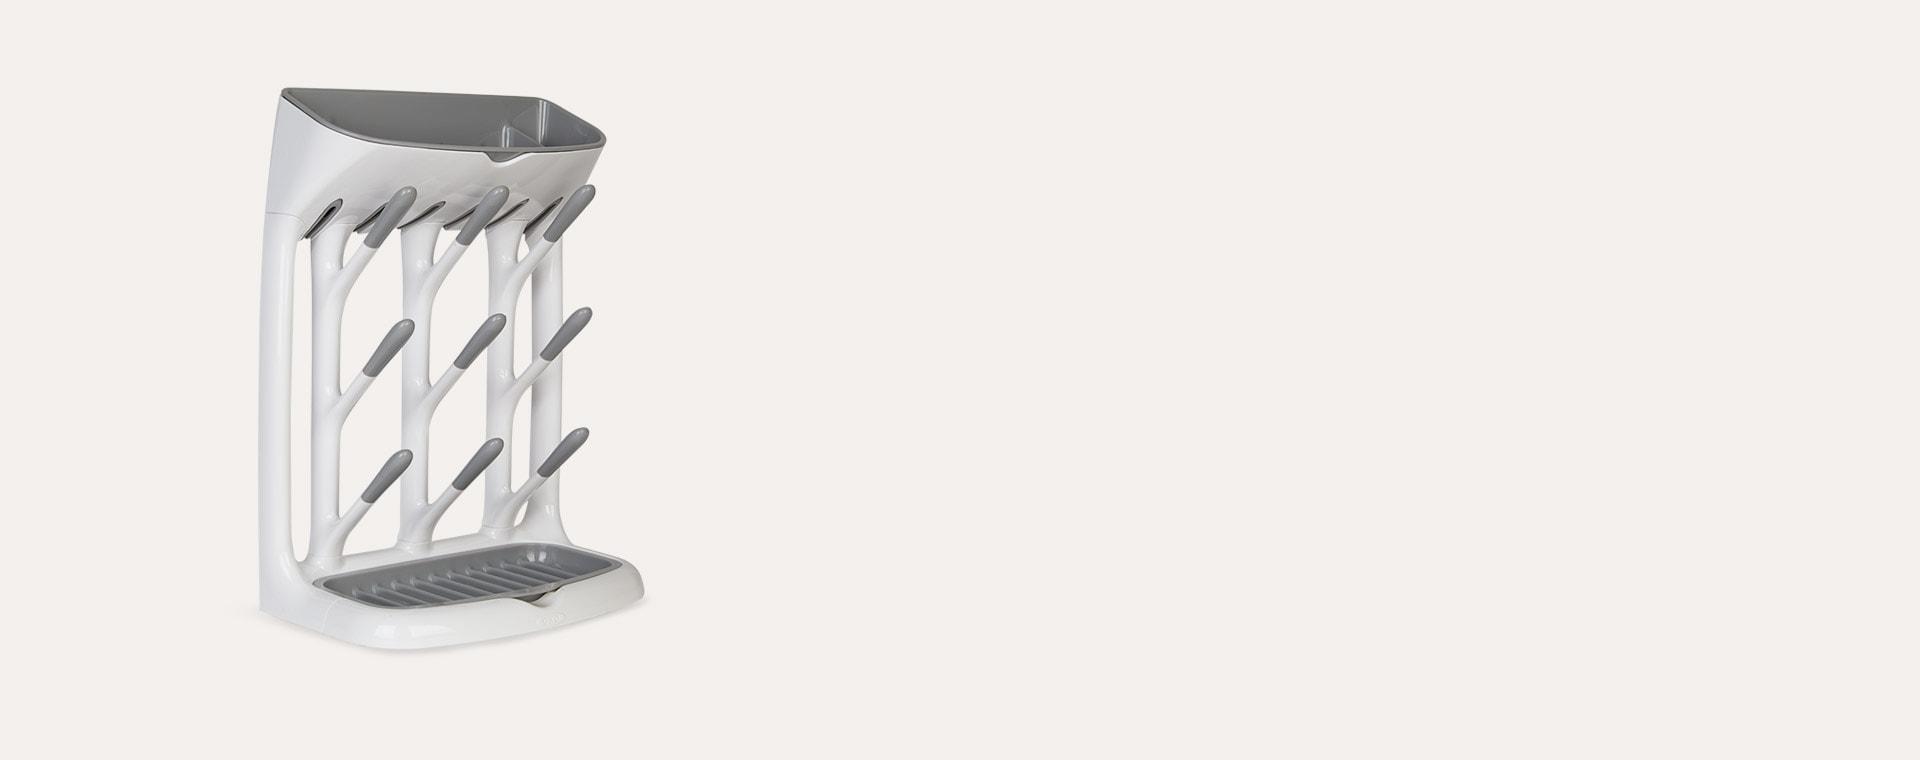 Grey OXO Tot Space Saving Drying Rack